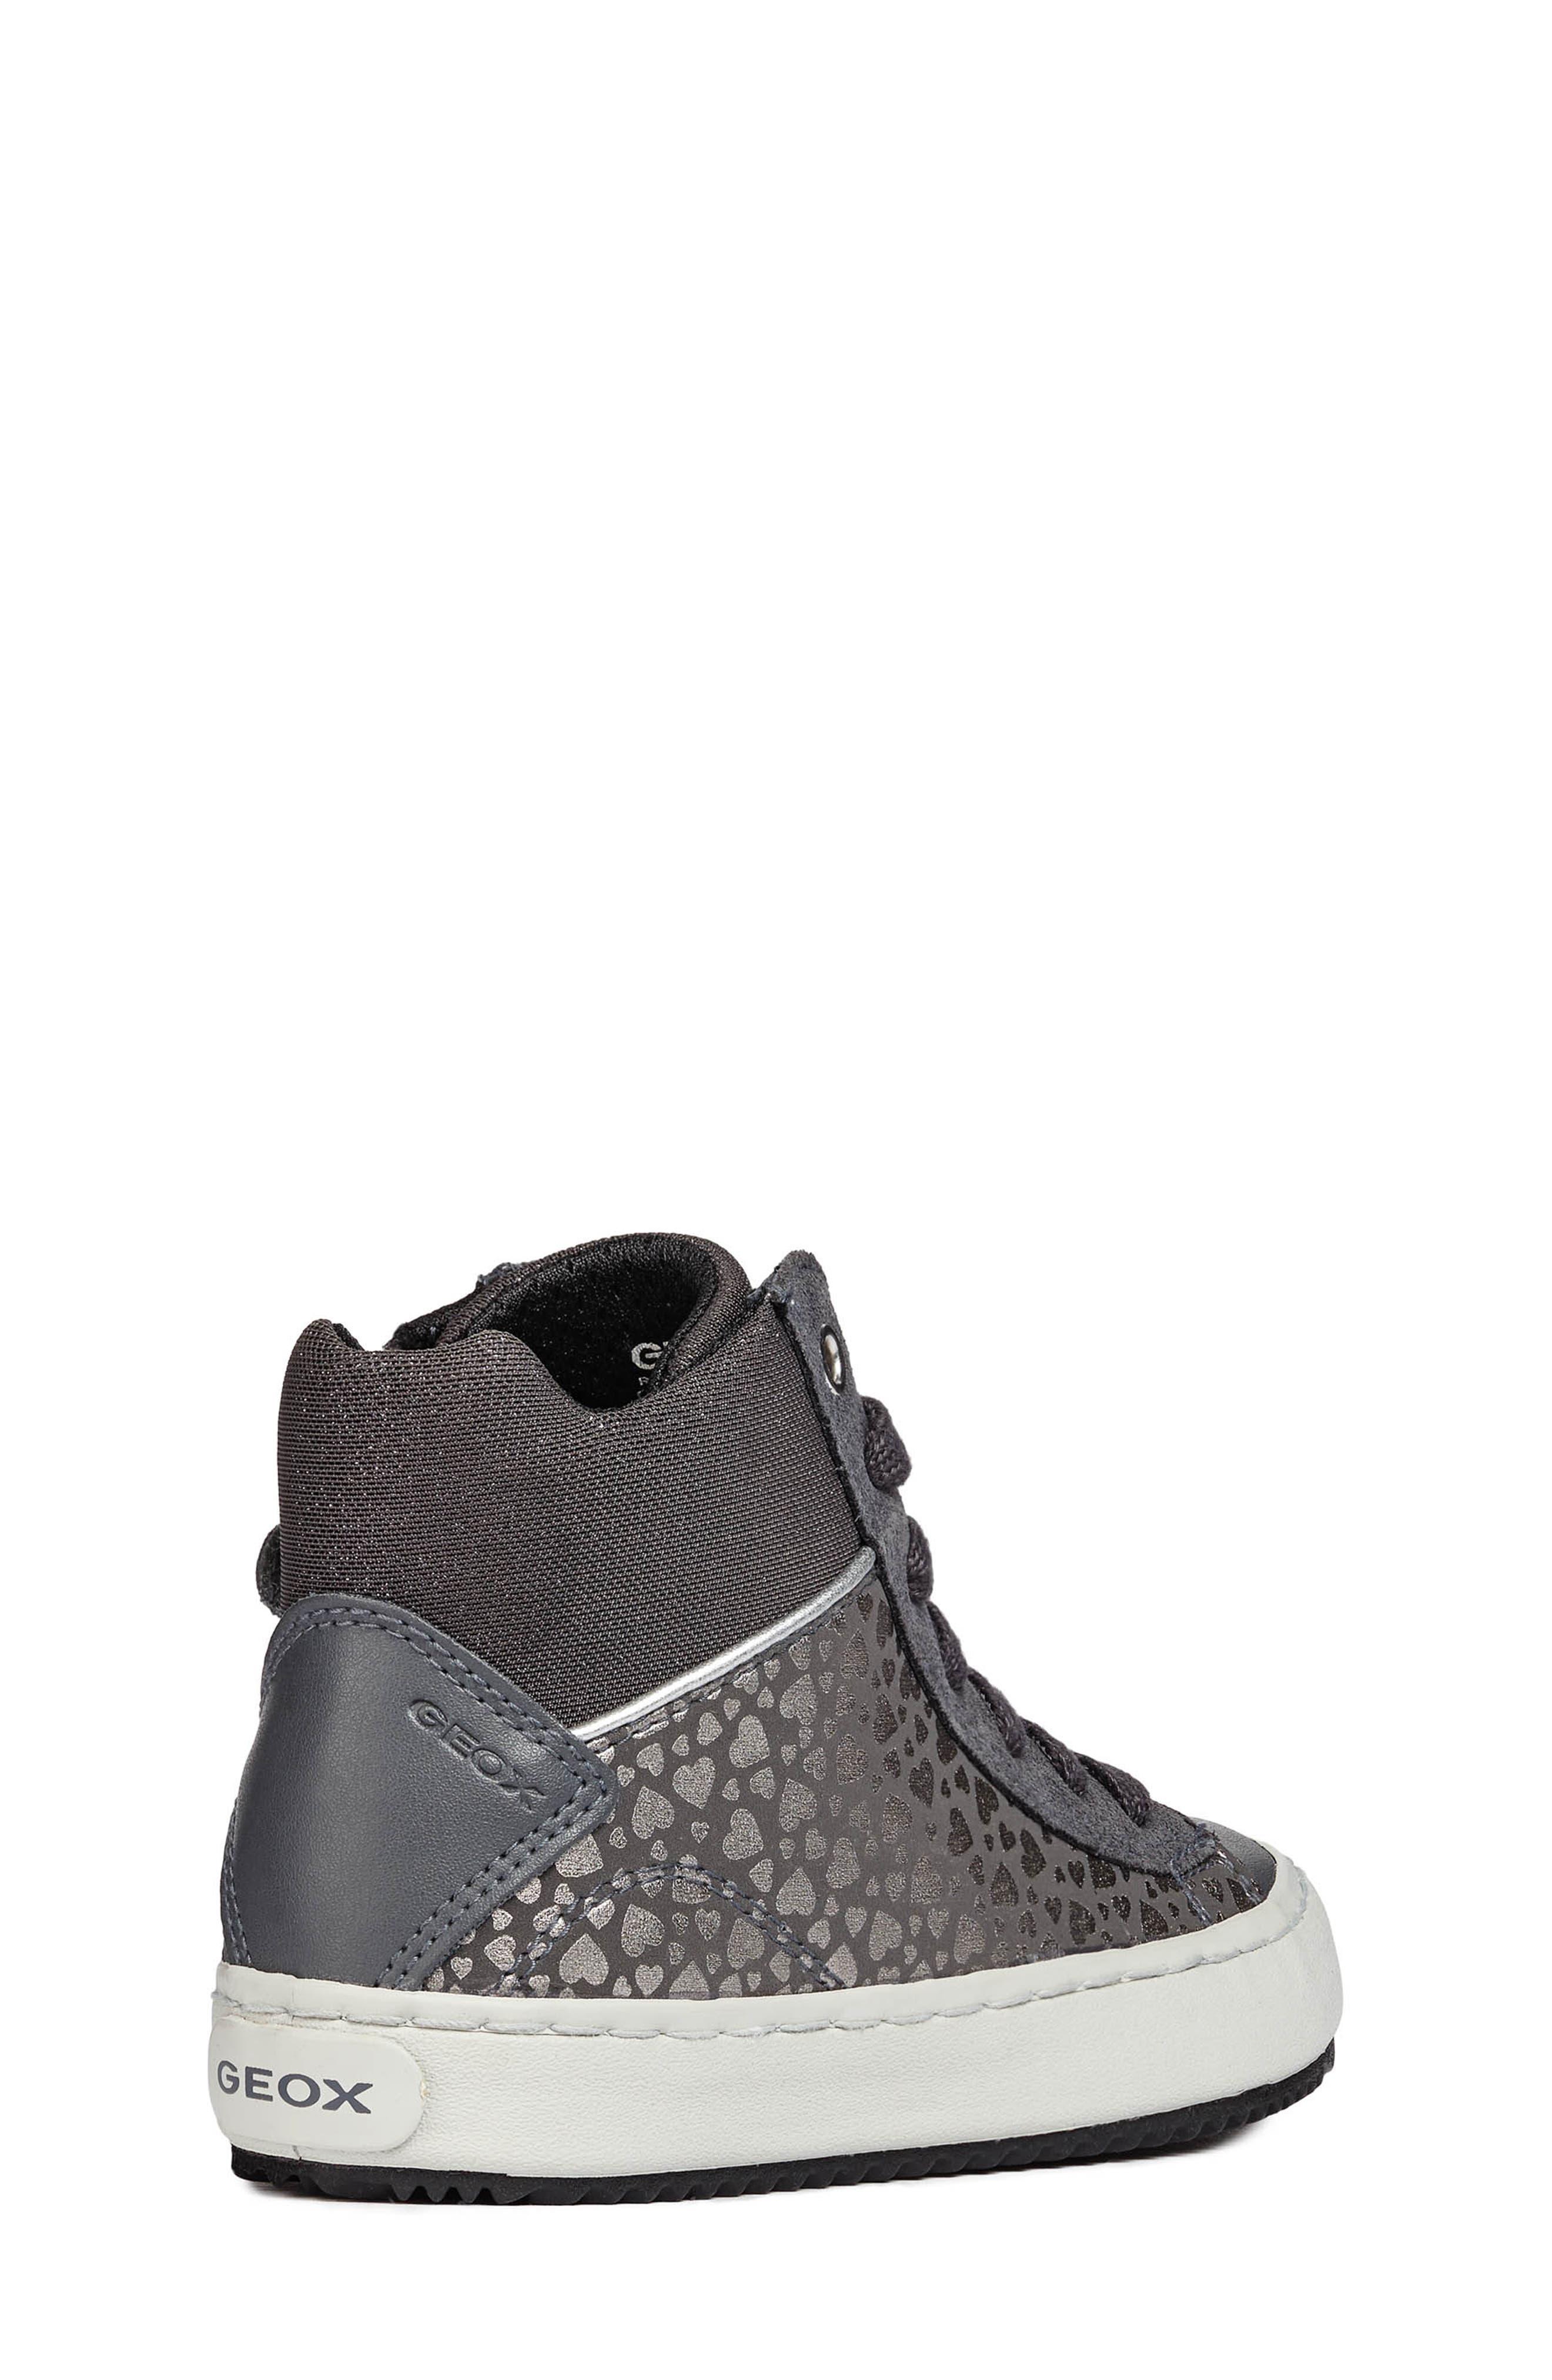 Kalispera High Top Sneaker,                             Alternate thumbnail 5, color,                             DARK GREY